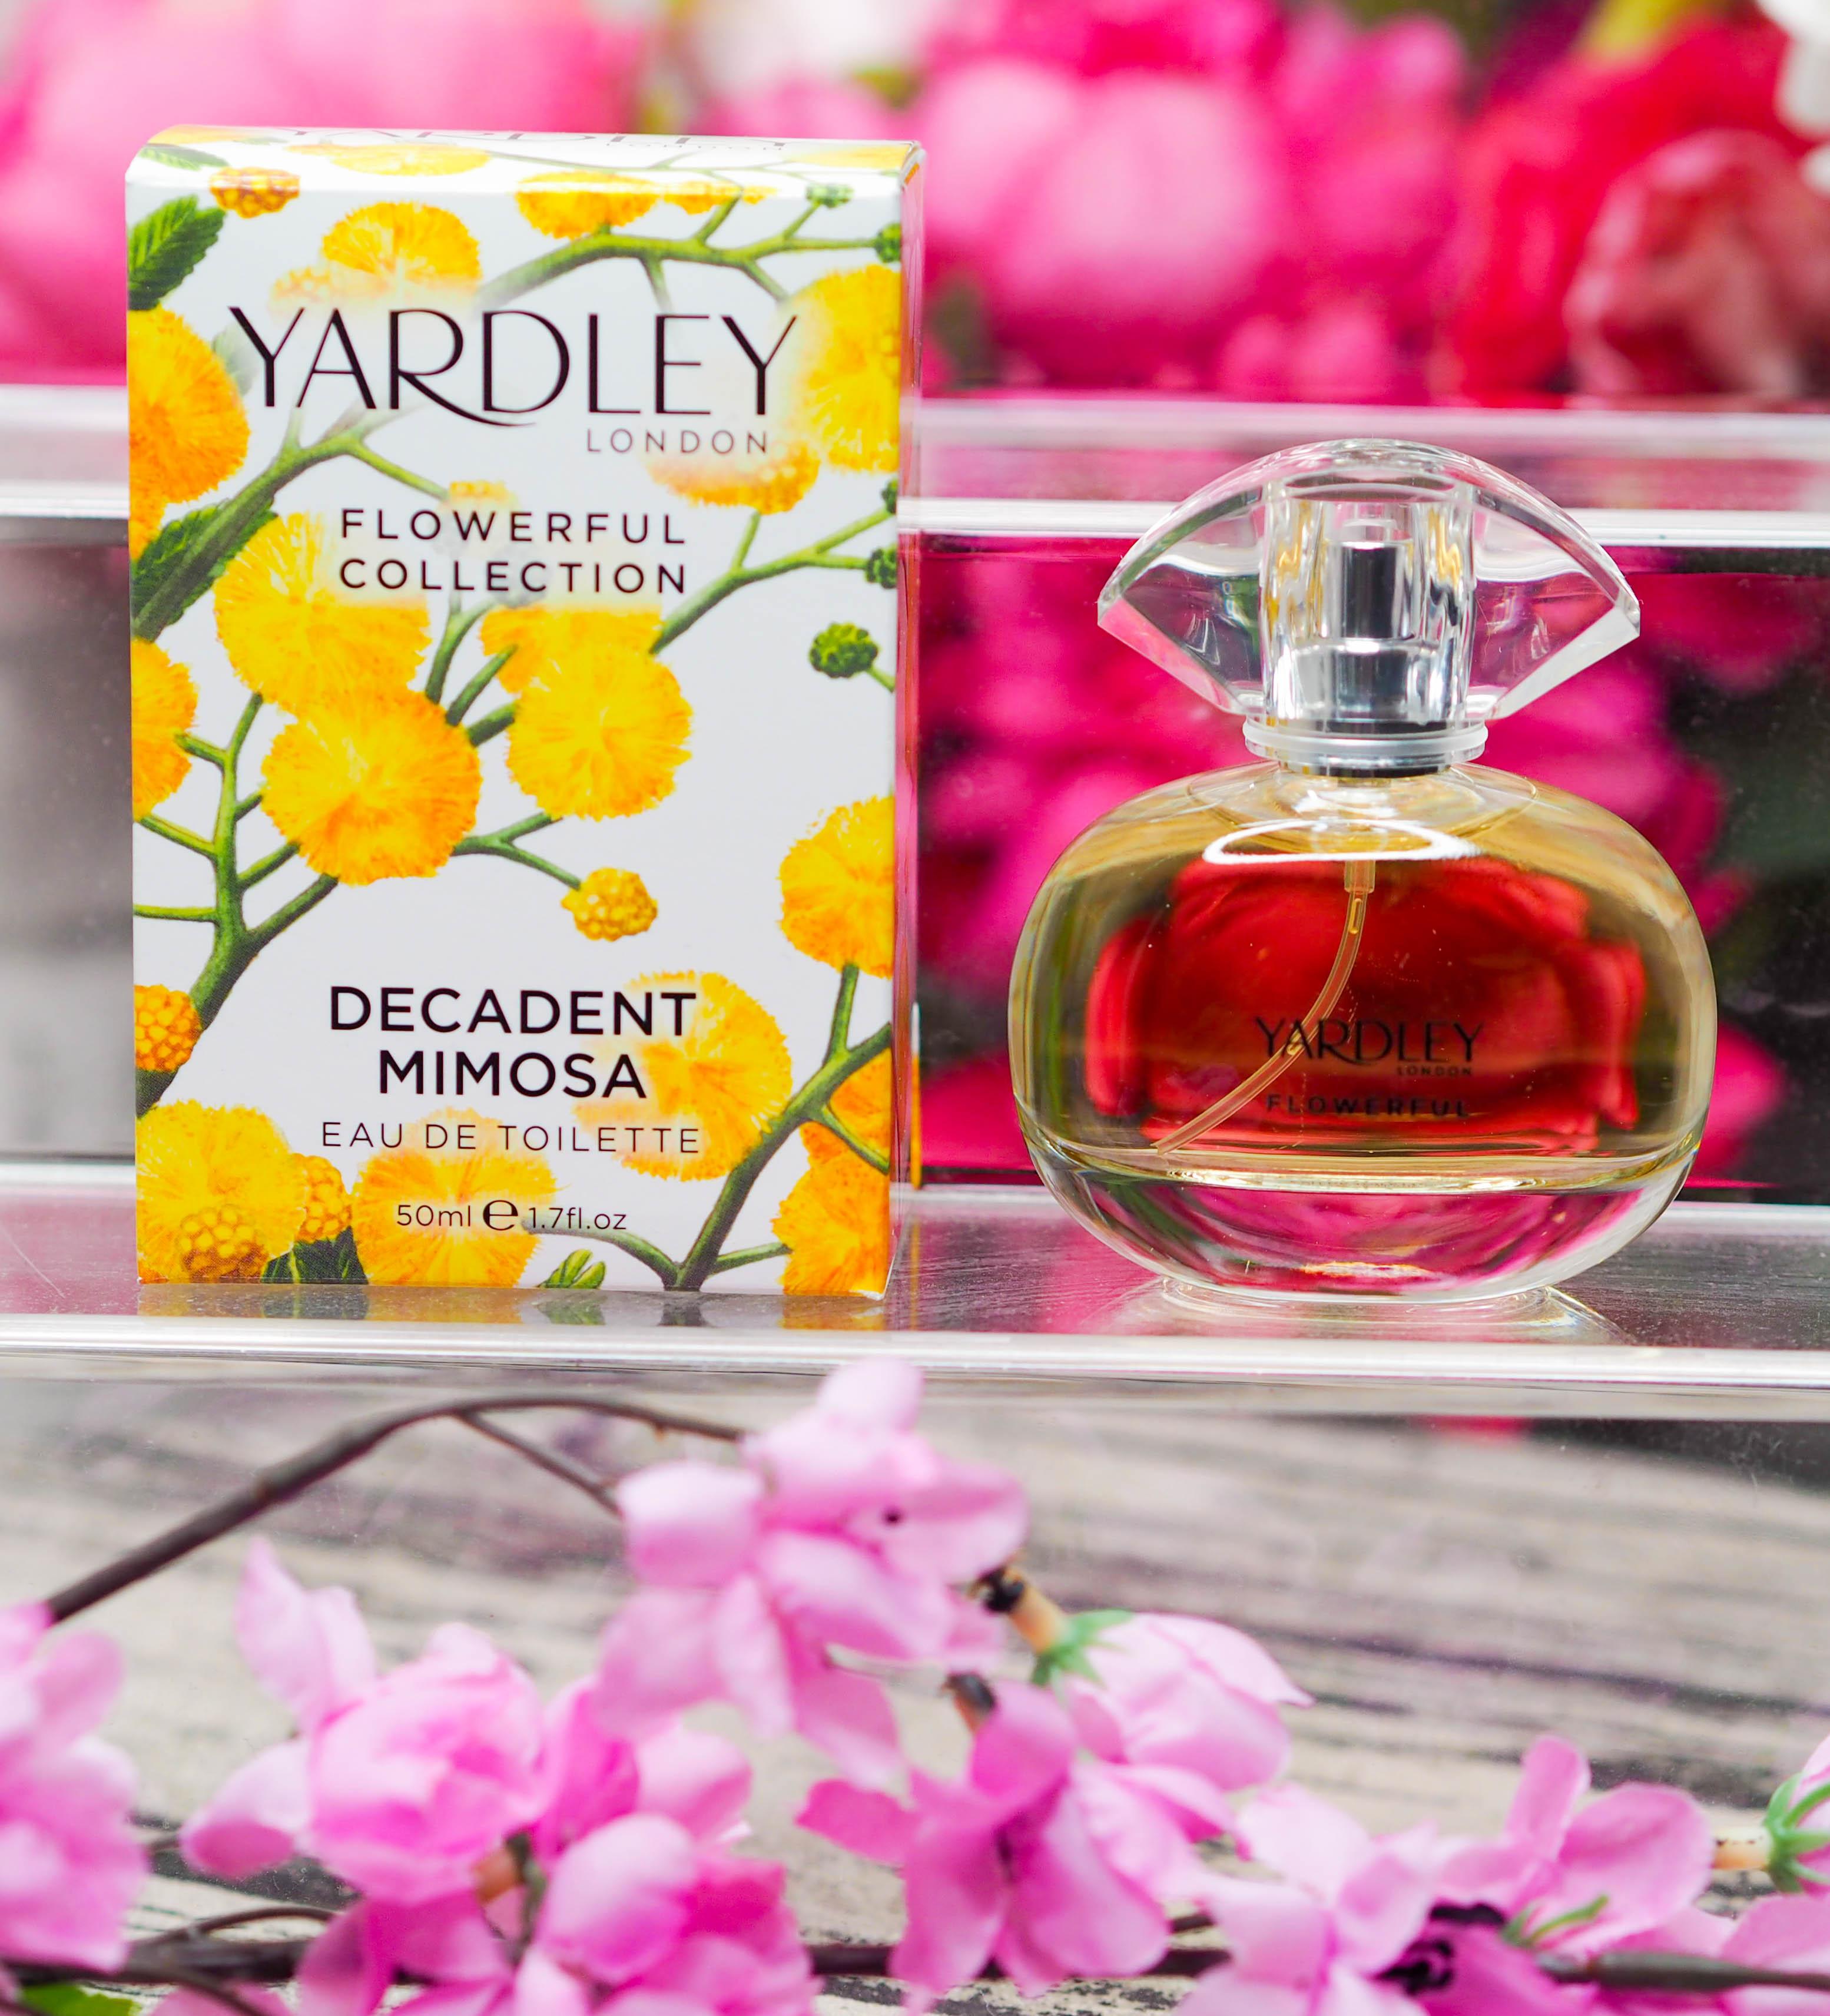 Yardley Decadent Mimosa